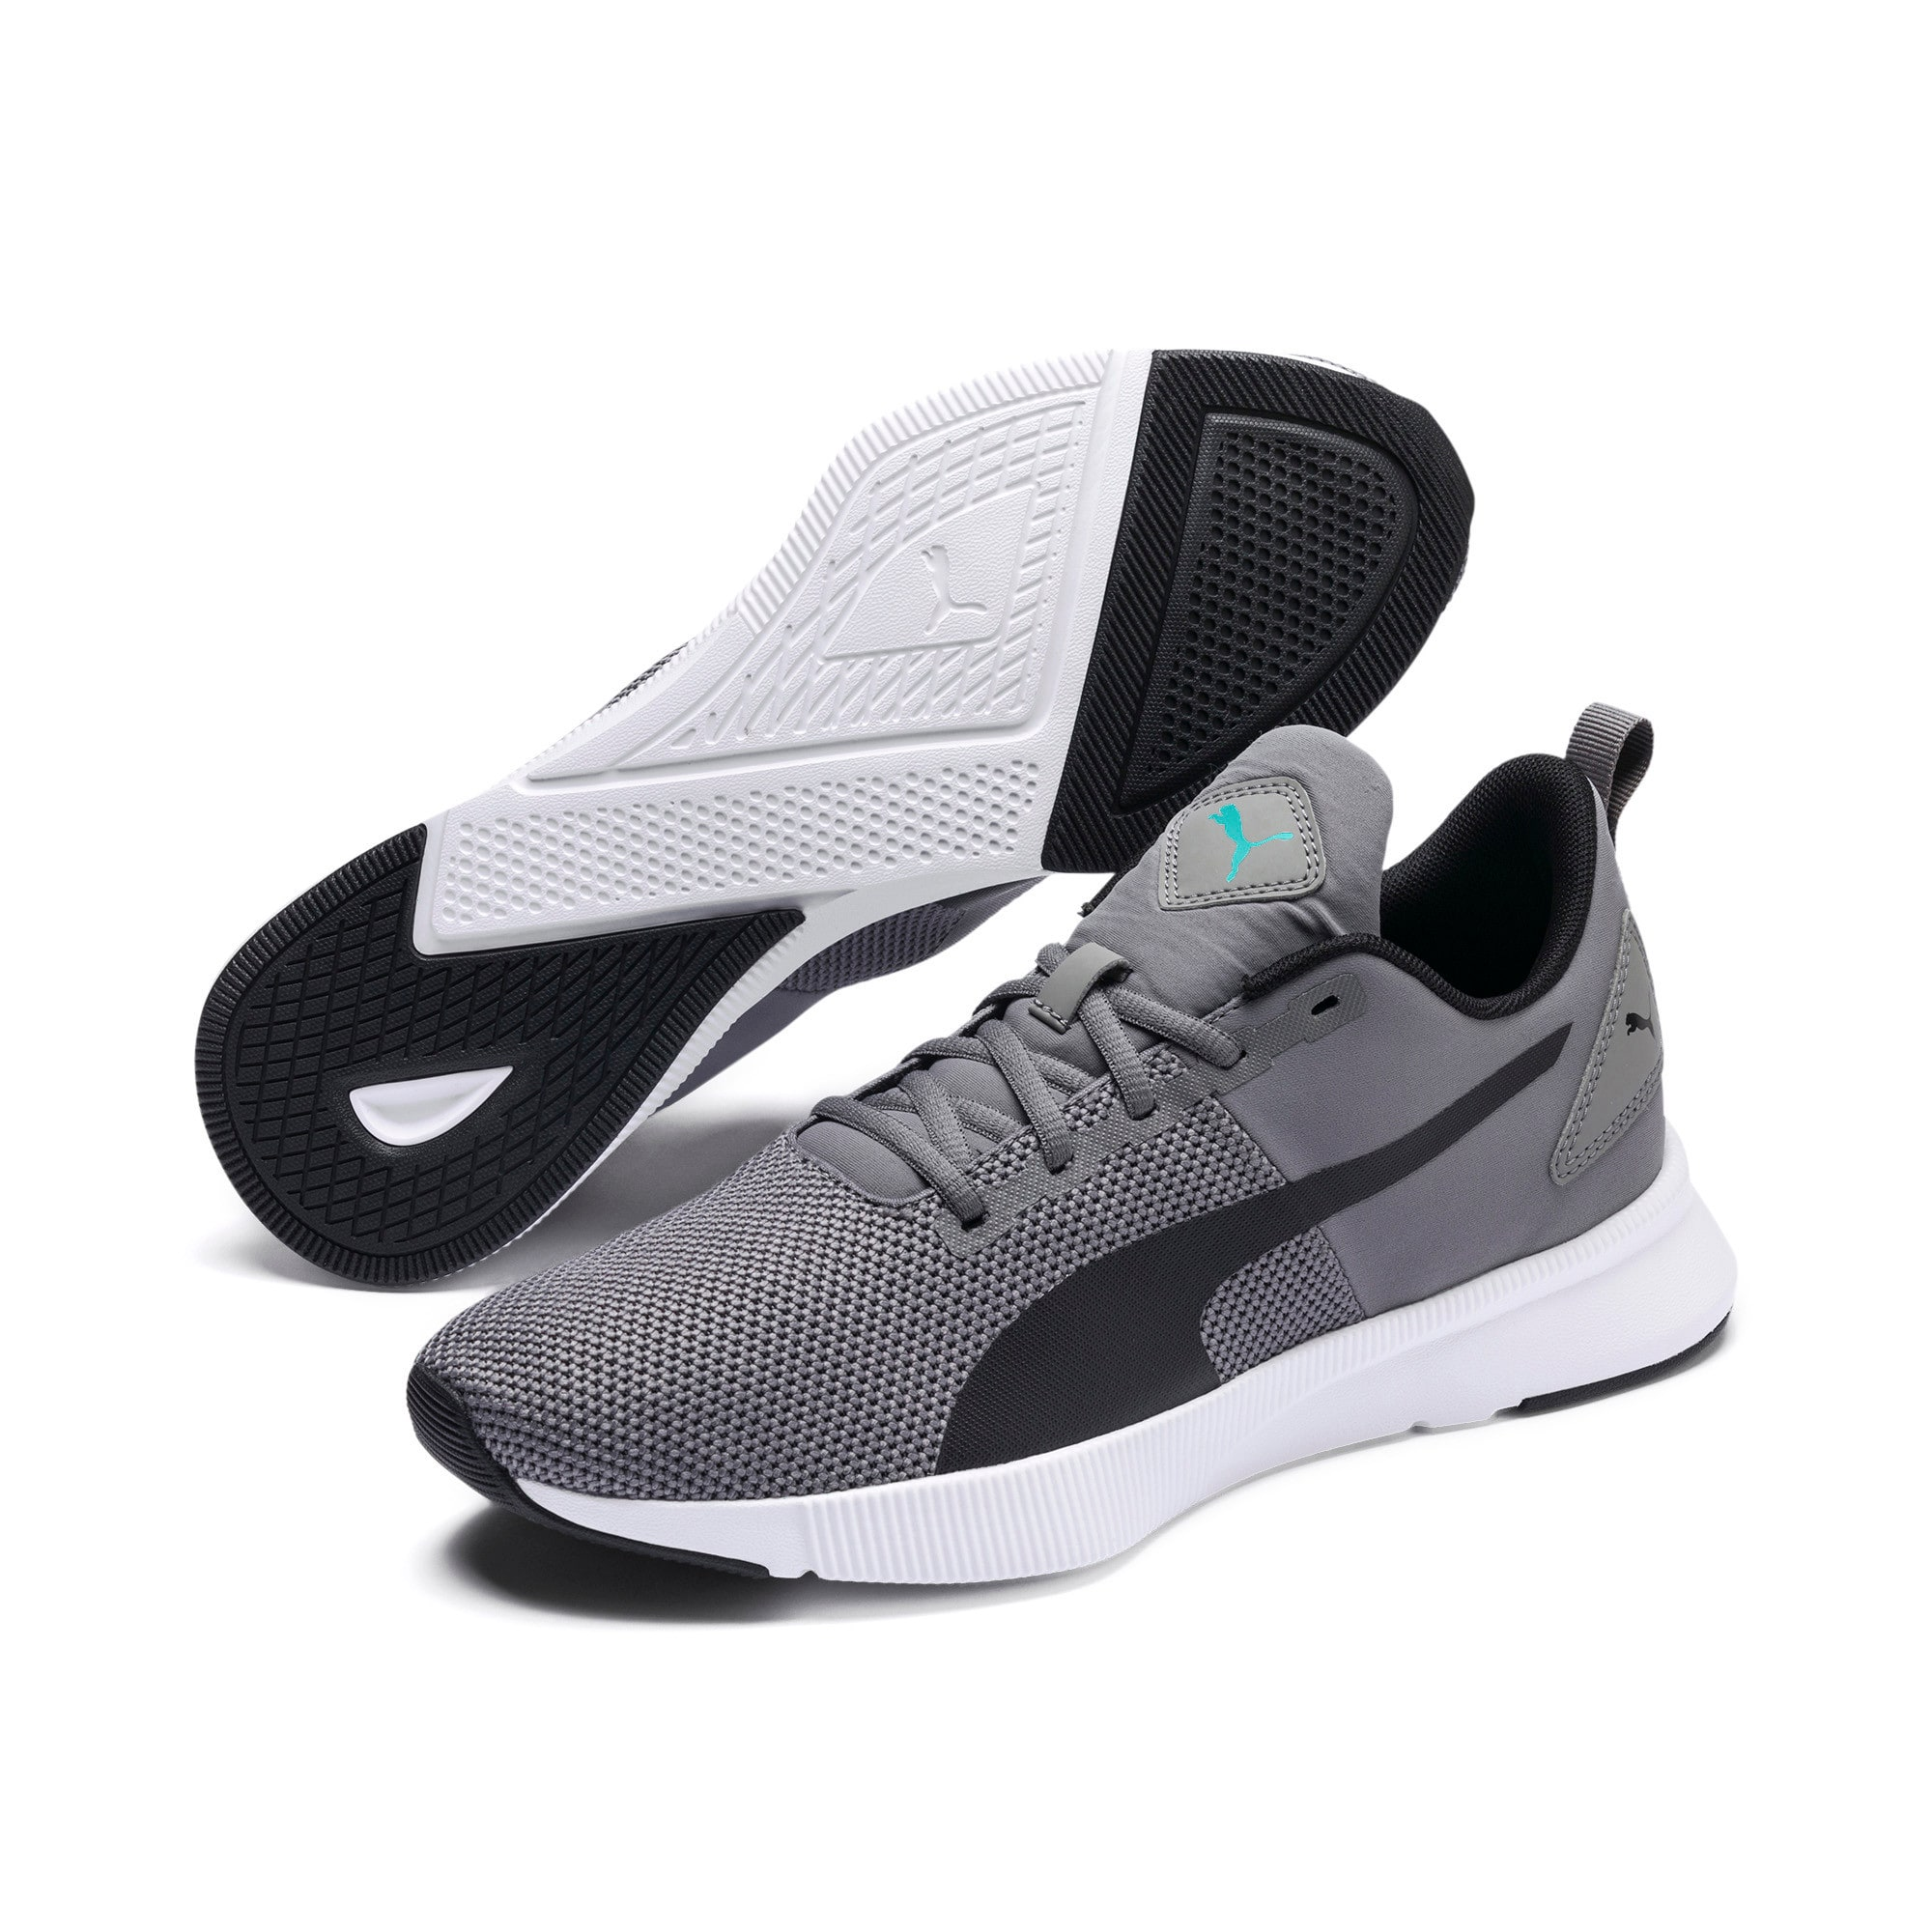 Thumbnail 2 of Flyer Runner Running Shoes, Charcoal-Black-Turquoise, medium